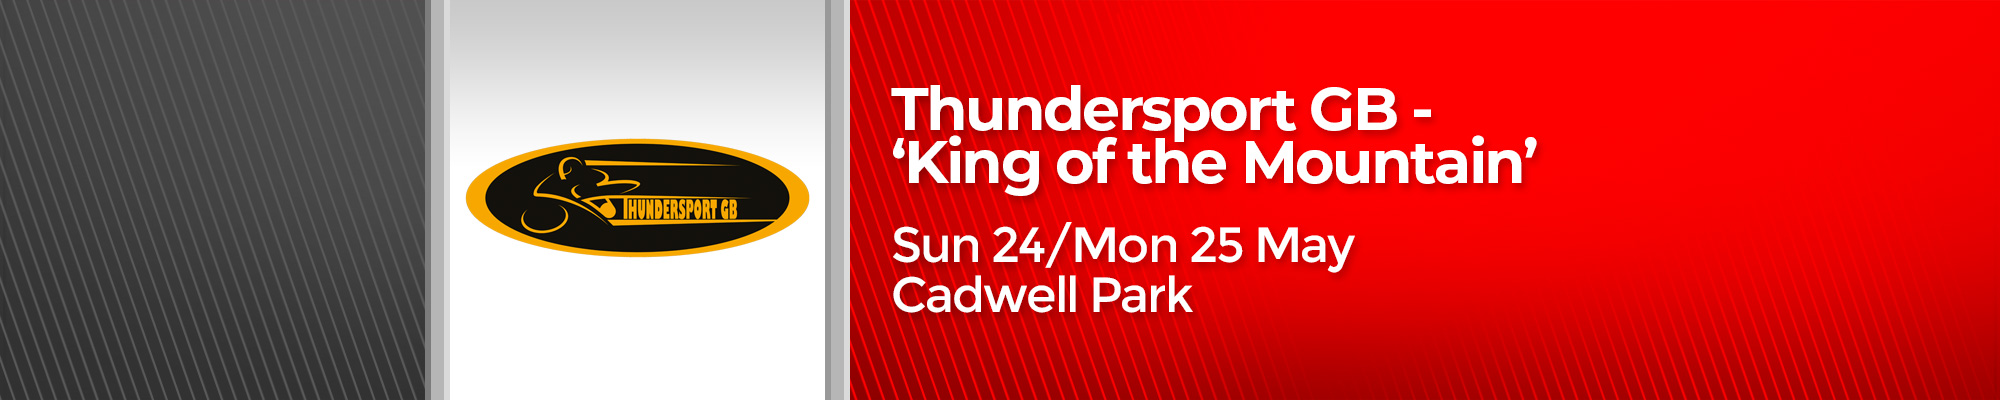 Thundersport GB - King of the Mountain - POSTPONED